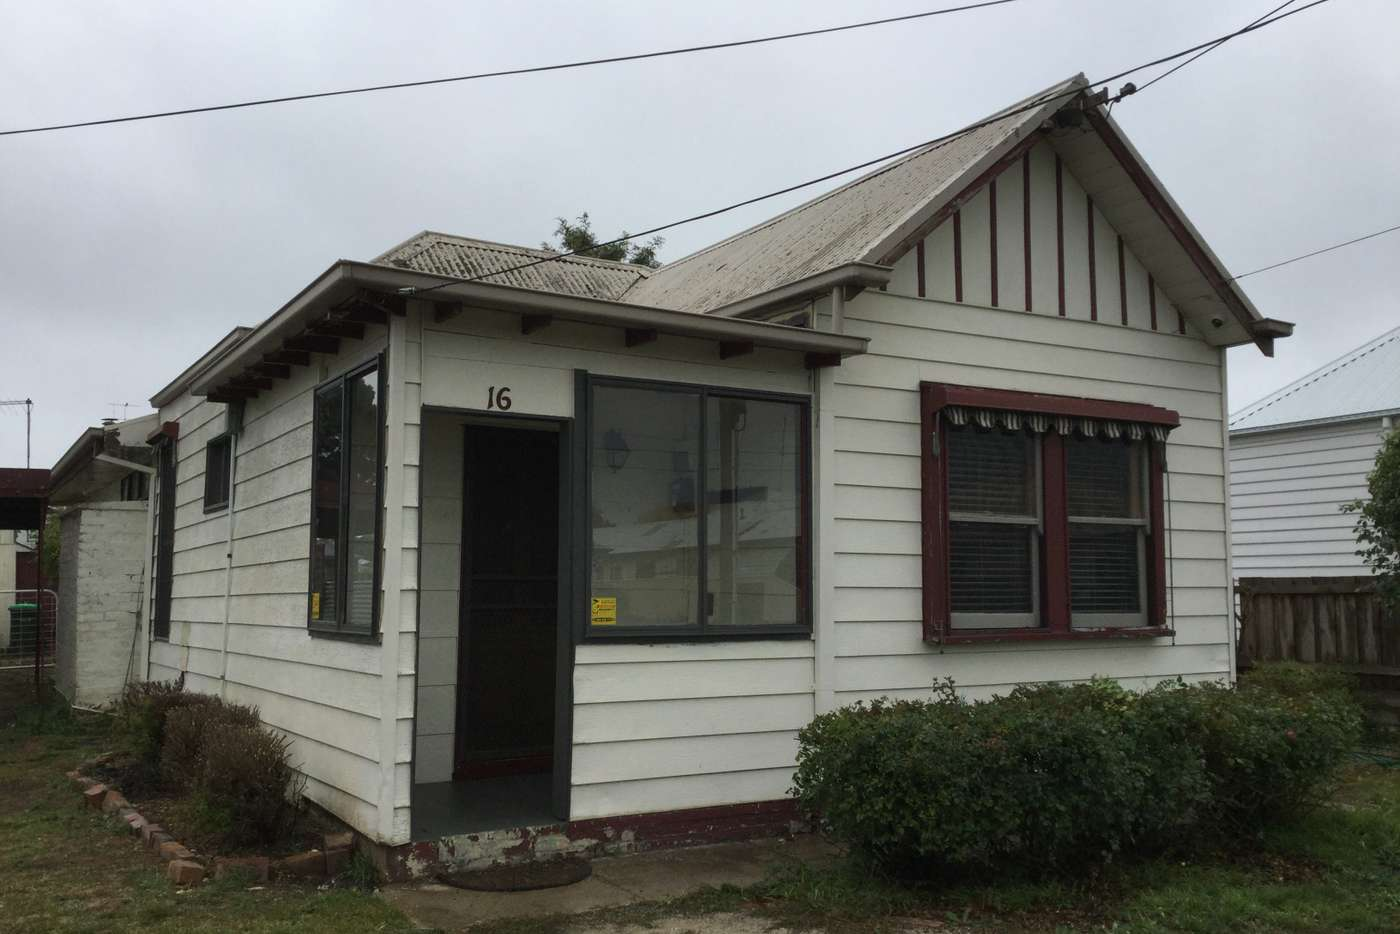 Main view of Homely house listing, 16 Victoria Street, Sebastopol VIC 3356